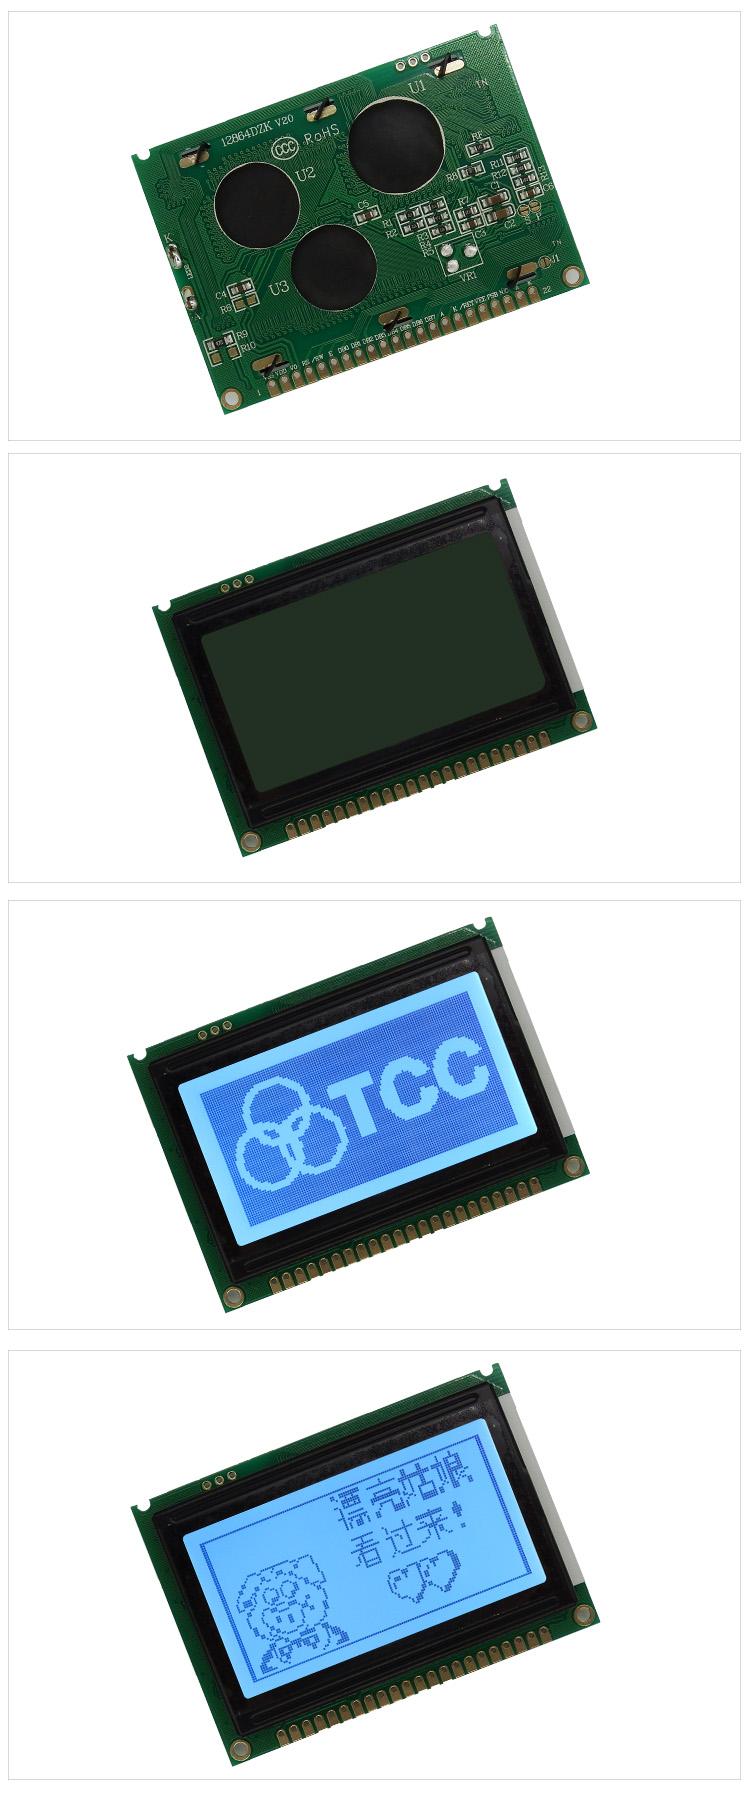 TCC(12864DZK) 22-pin small 128x64 3.3v/5v 8-bit parallel/serial screen fstn st7920 graphic lcd display module